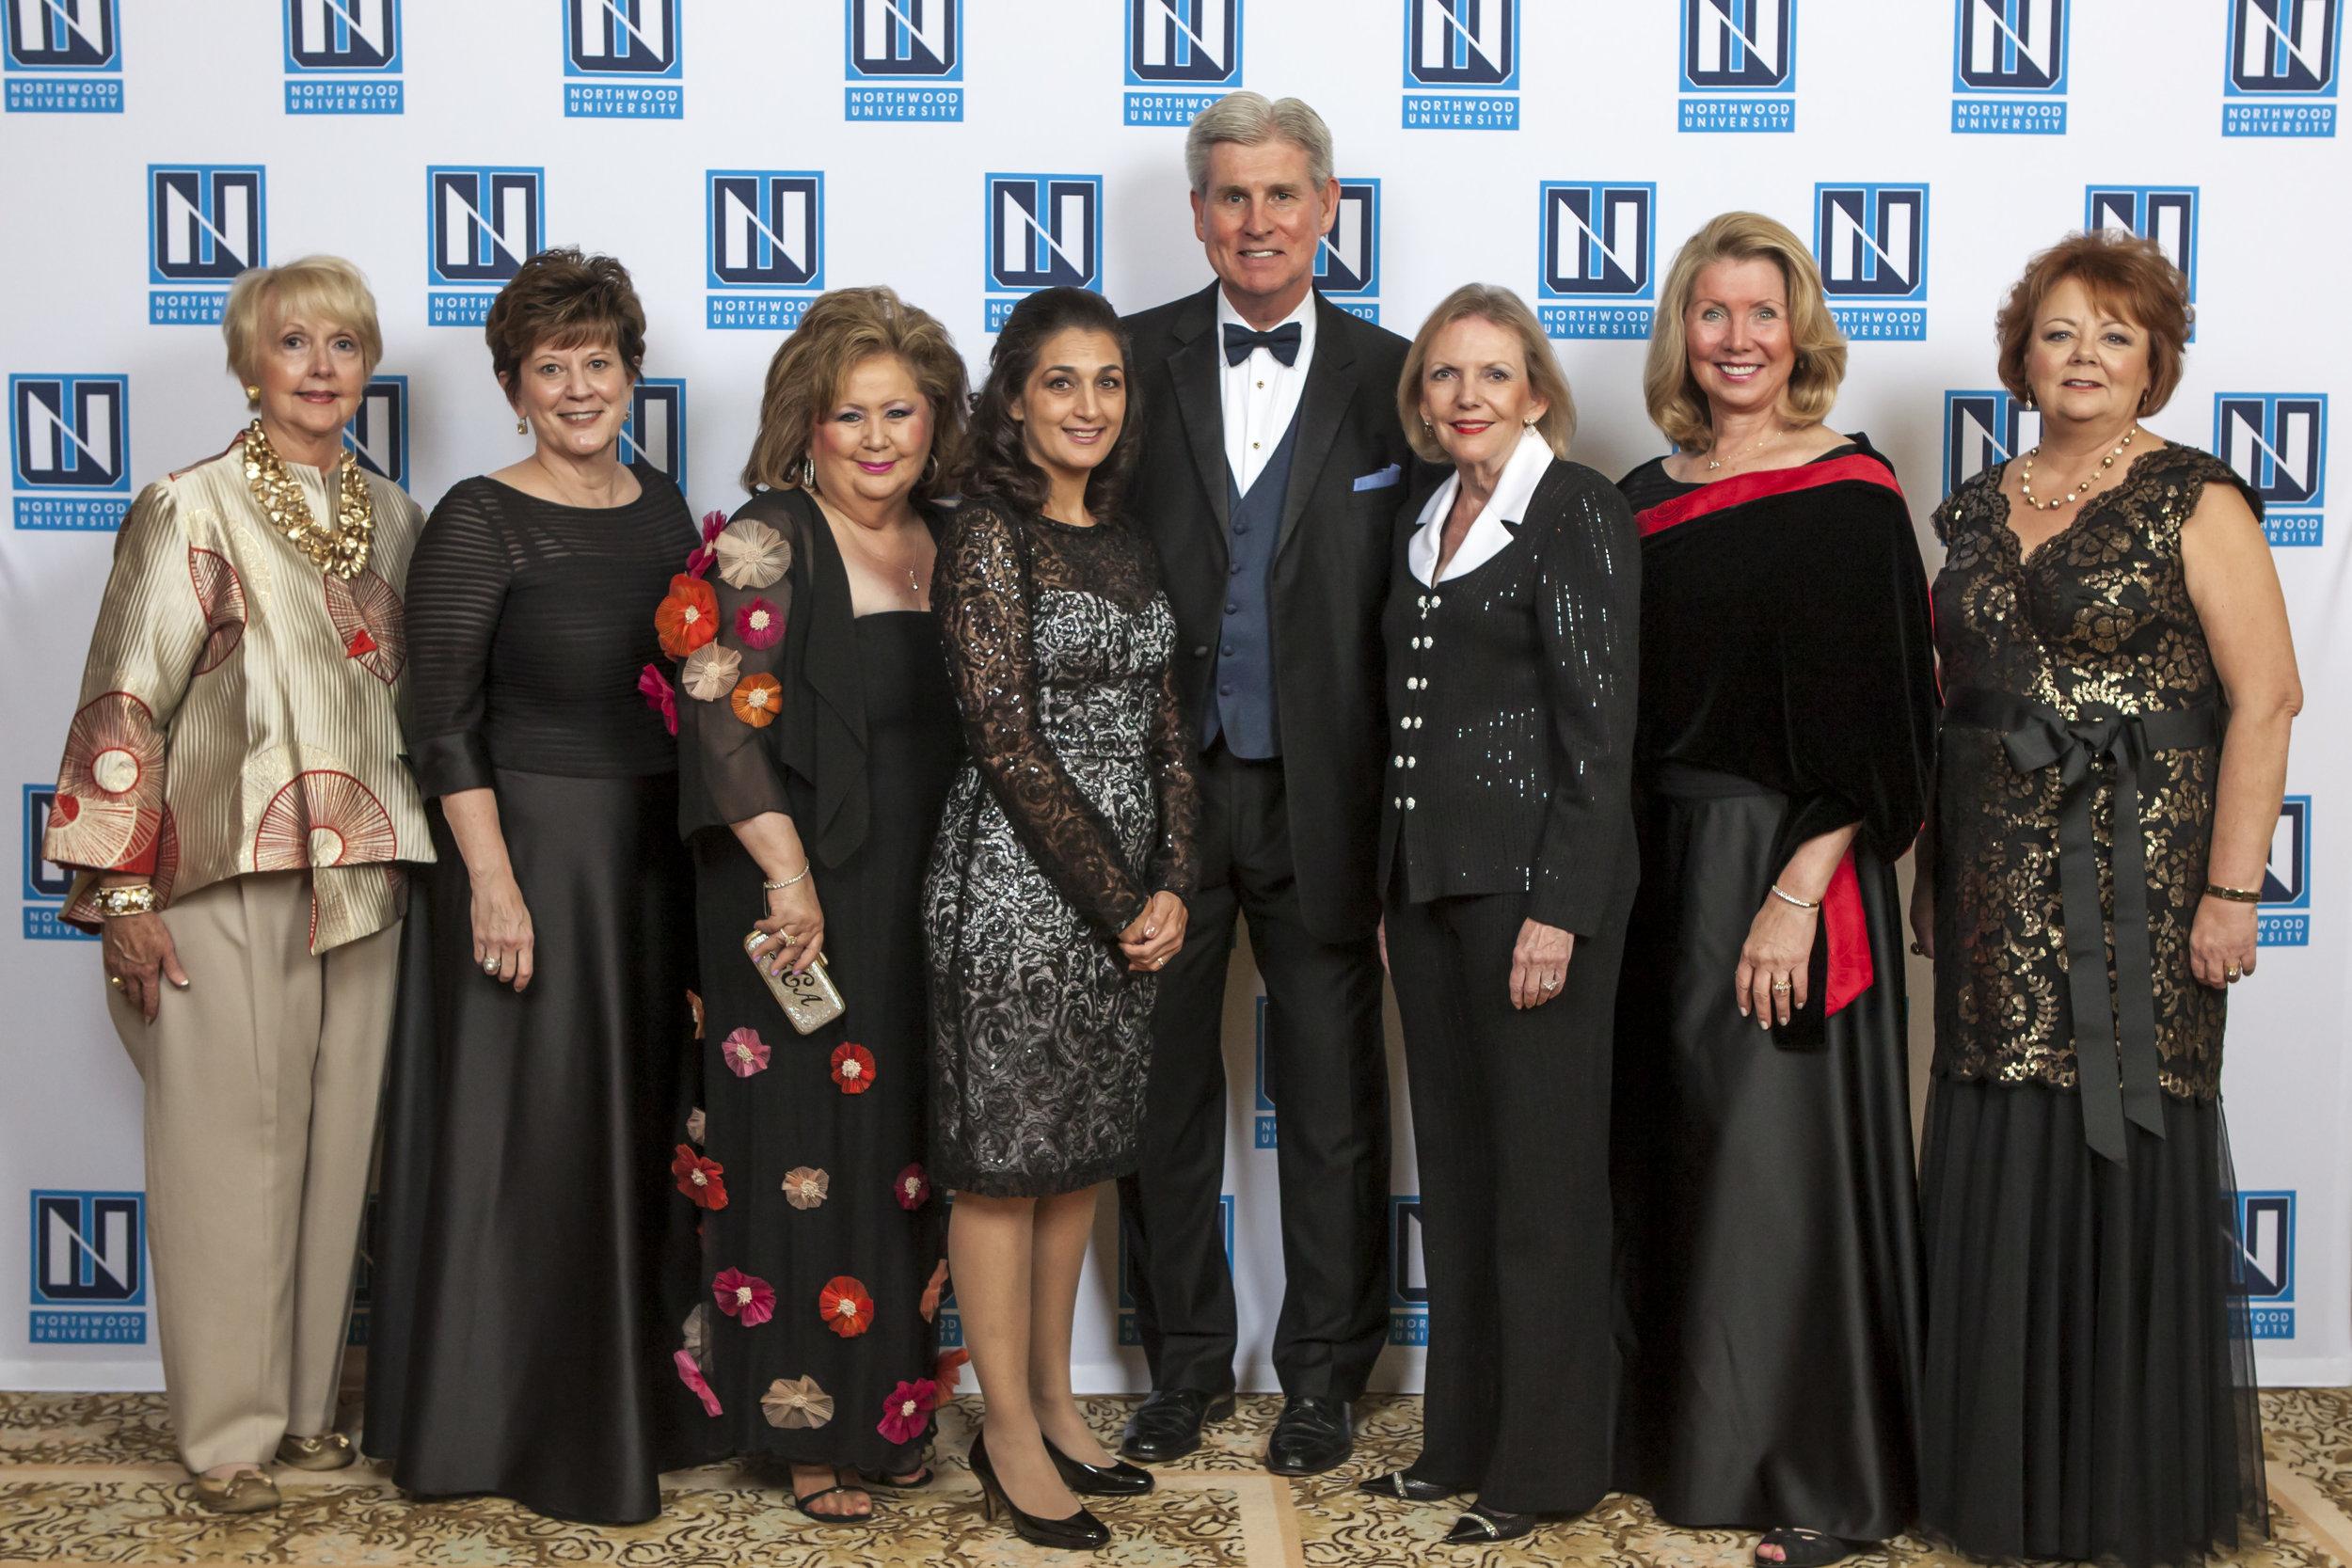 DW-Group-Photo-with-President-Pretty-11-8-2014.jpg